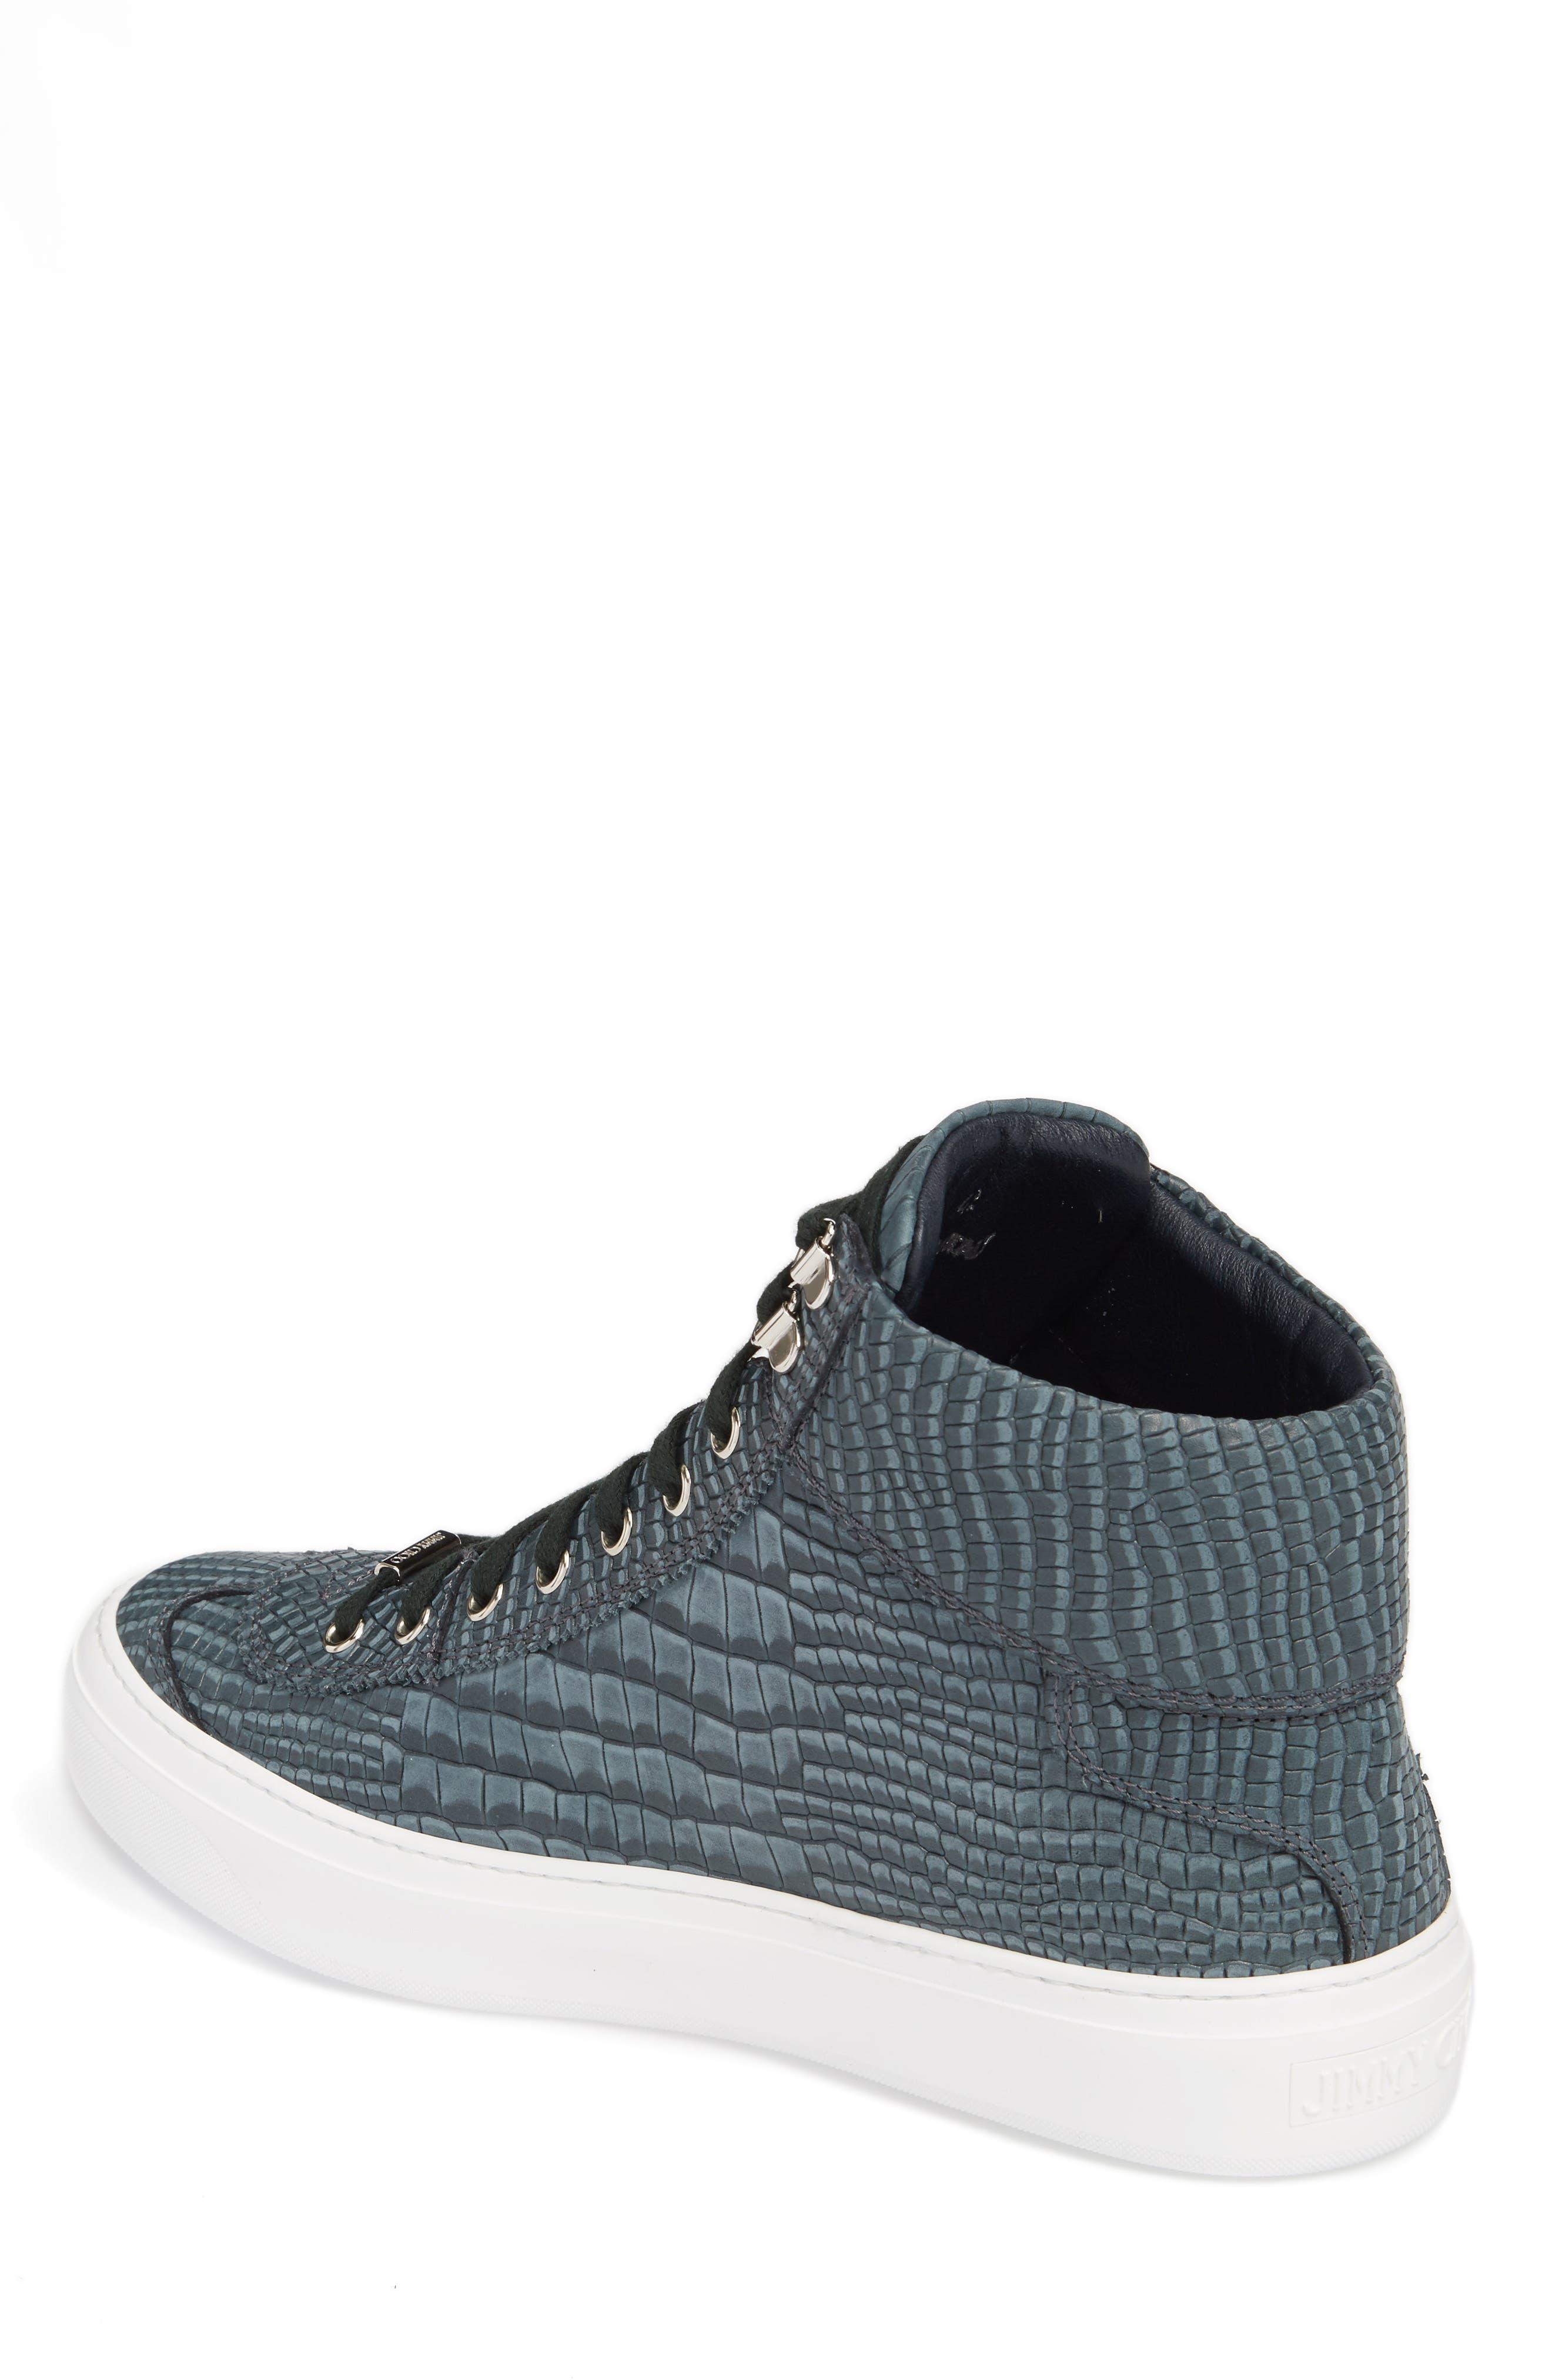 Argyle Sneaker,                             Alternate thumbnail 2, color,                             301